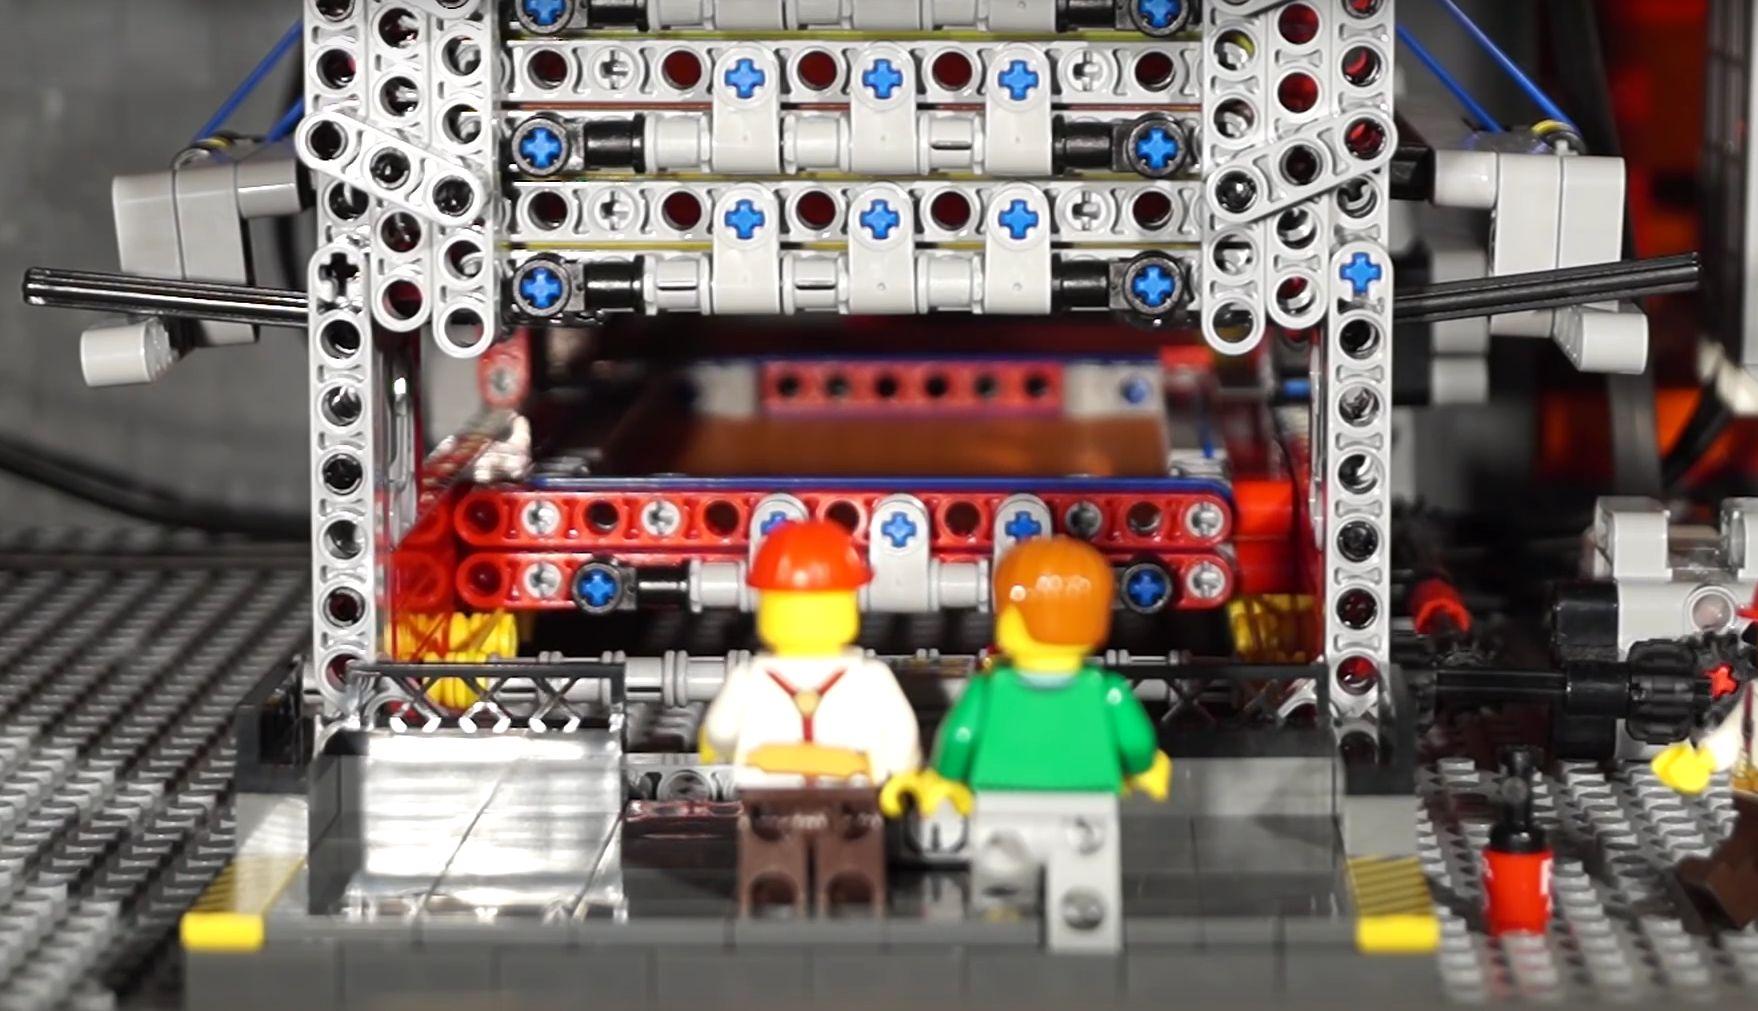 Alles vollautomatisch: Papierwürfel per Lego Mindstorms